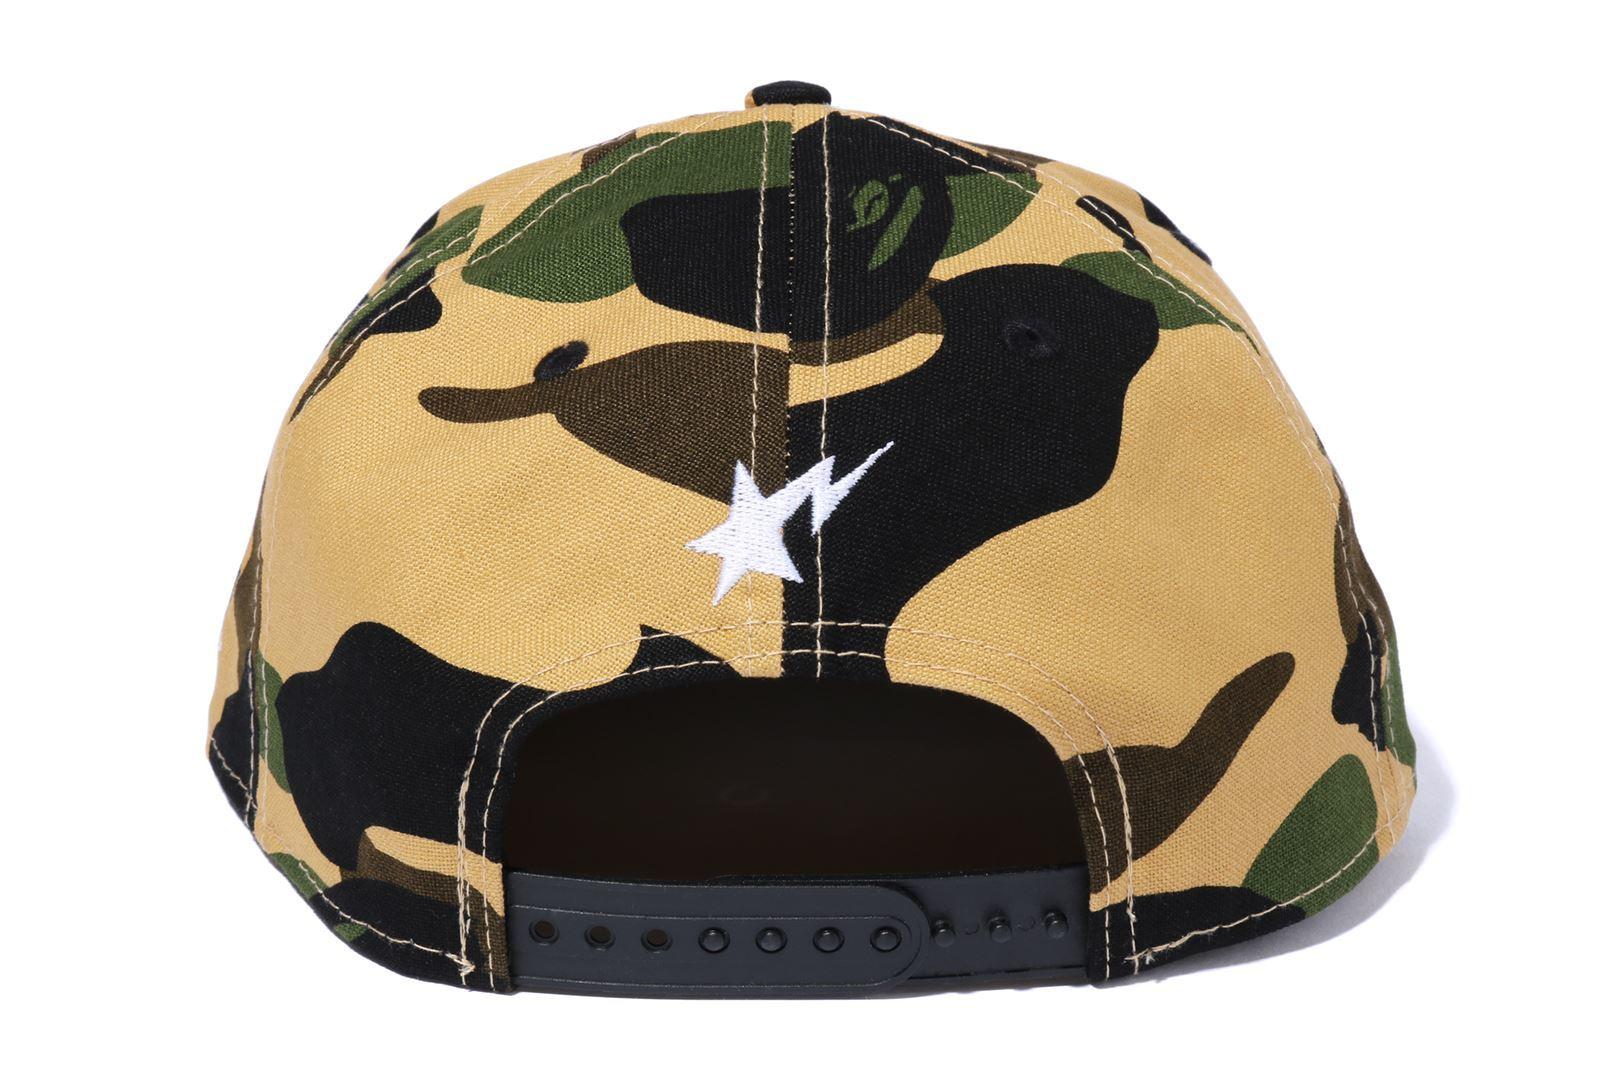 1ST CAMO BAPE NEW ERA SNAP BACK CAP_a0174495_17595255.jpg